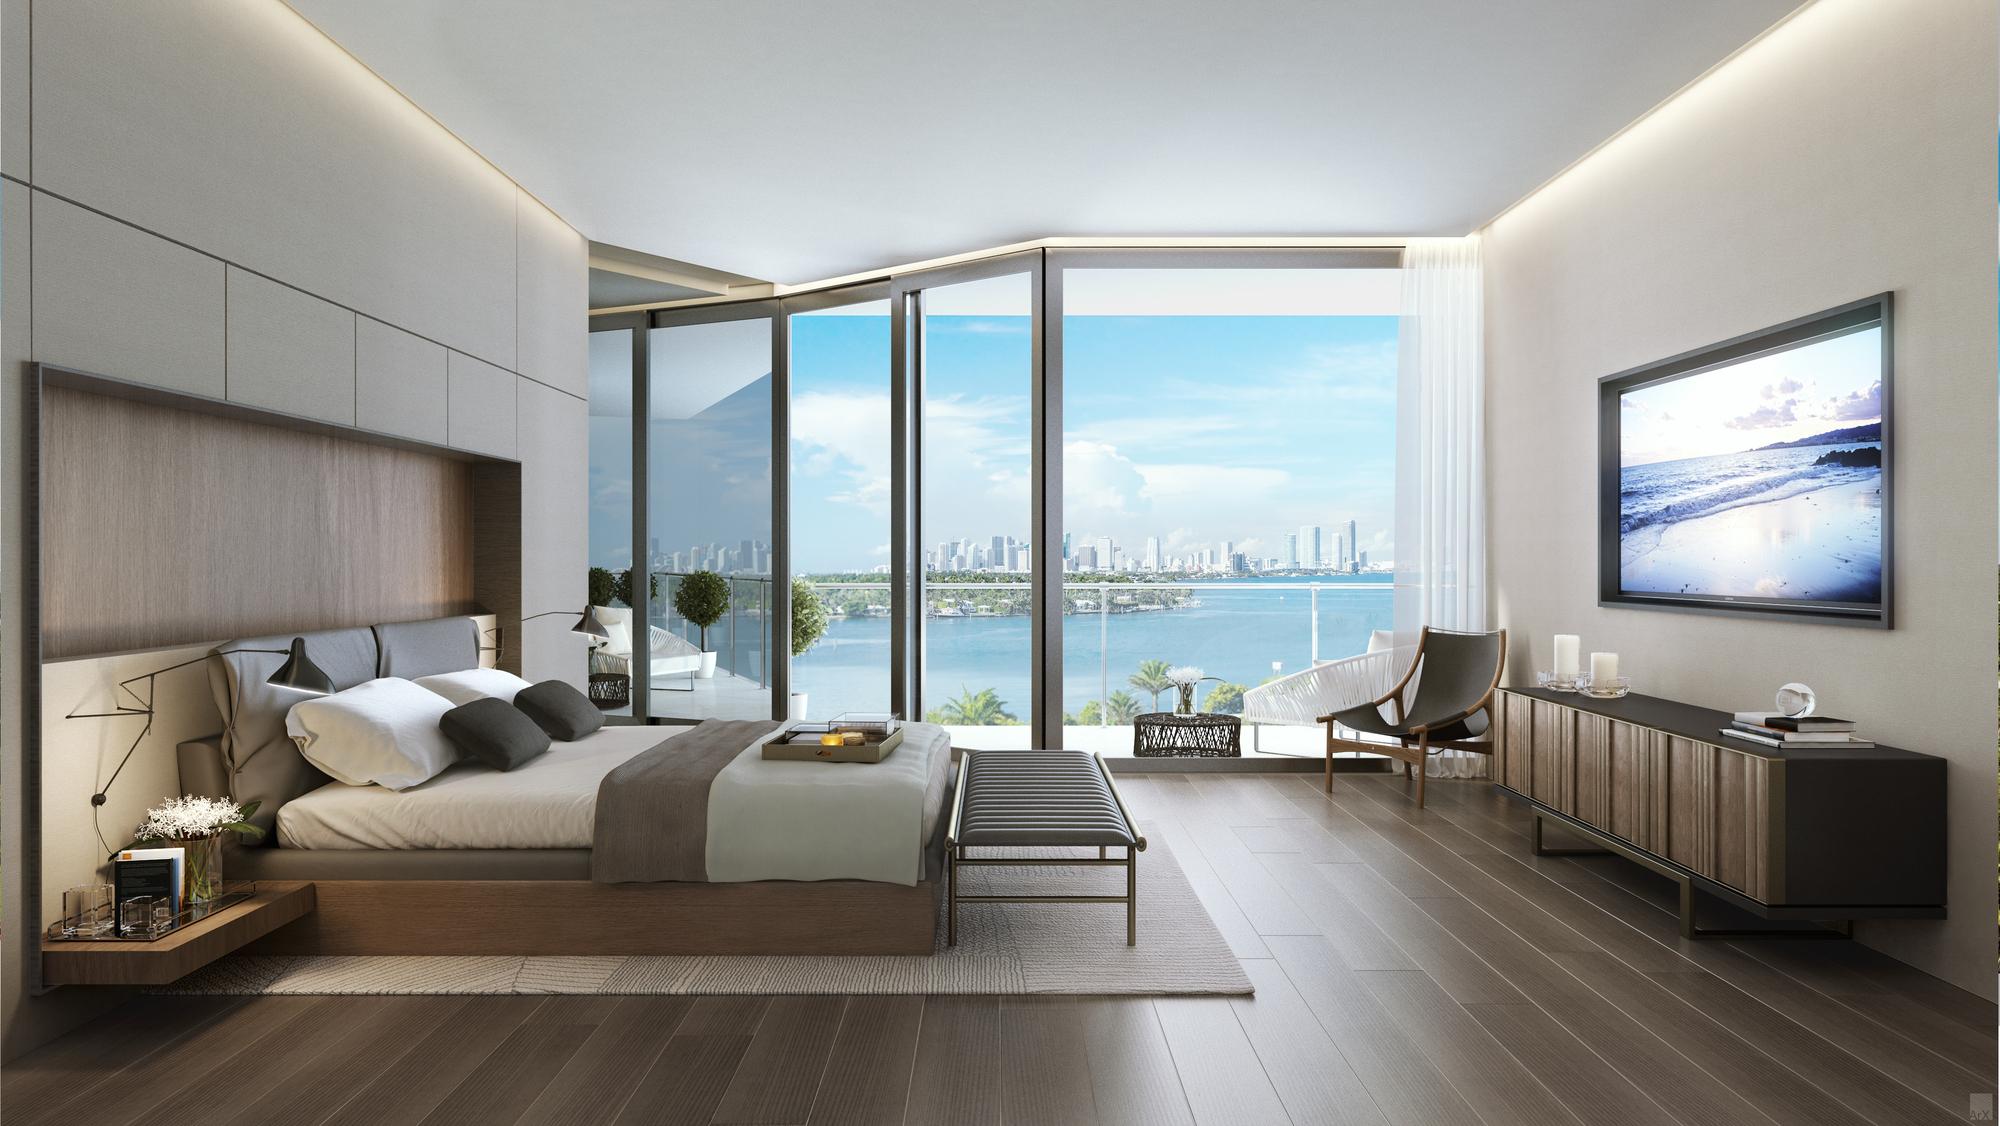 Gallery Of Ricardo Bofill Makes Us Condominium Debut With 3900 Alton In Miami Beach 15